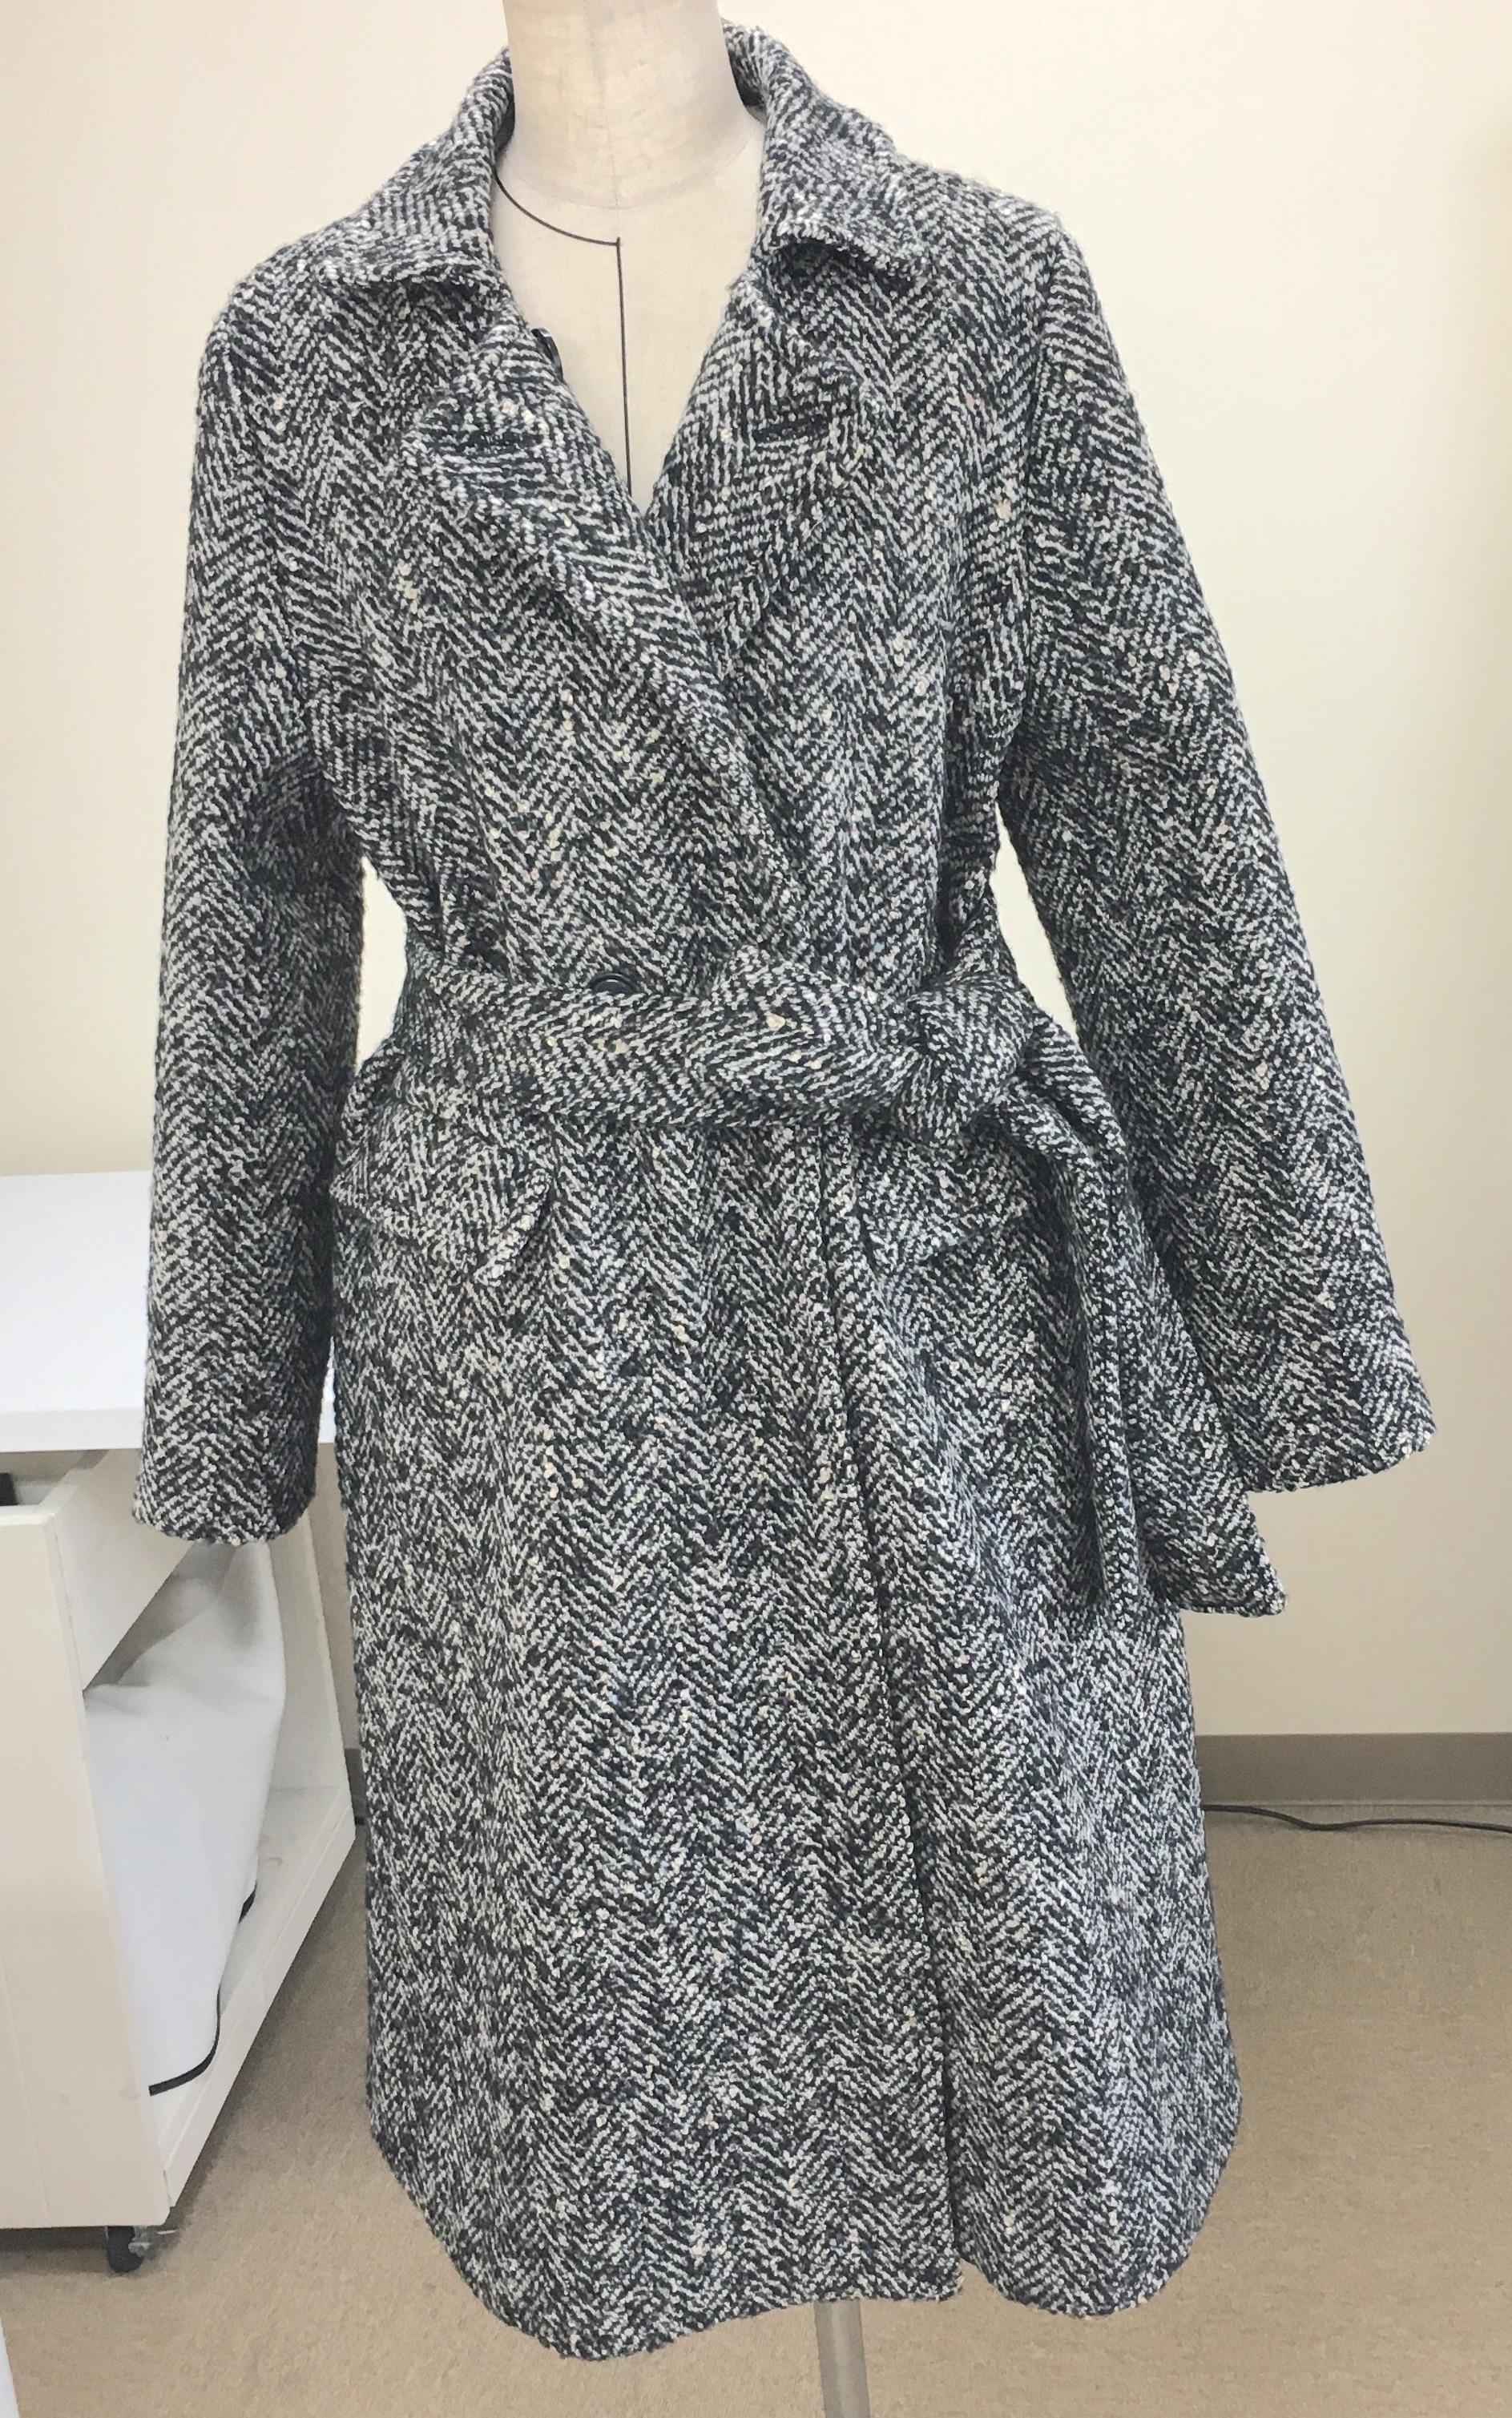 W011 Aラインベルテッドコートの型紙